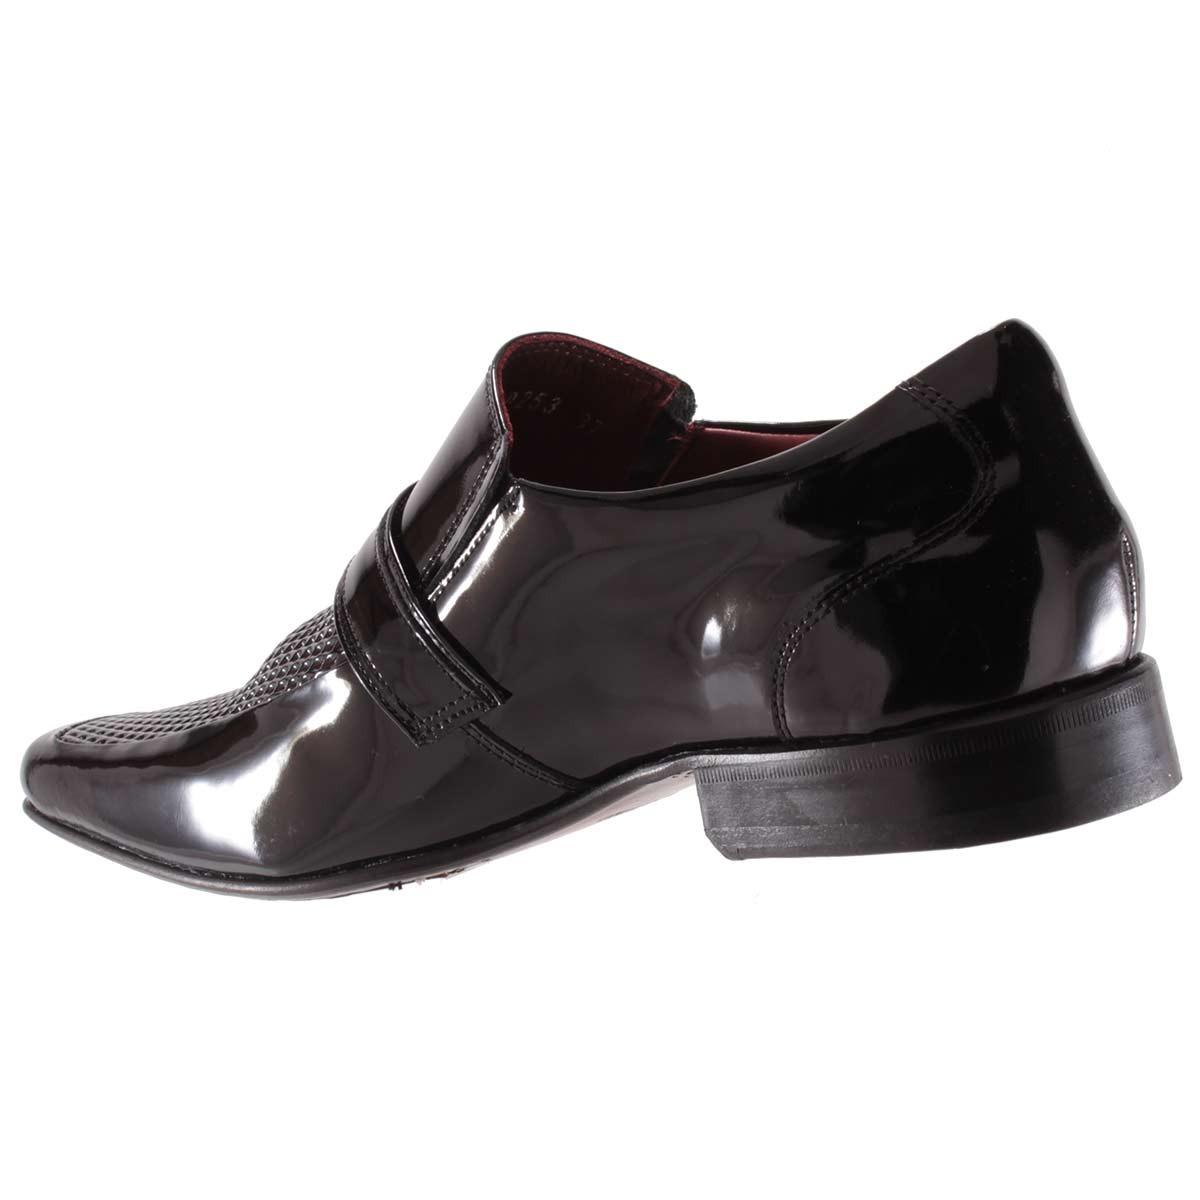 e13455fac sapato social gofer masculino fivela couro verniz 0253a. Carregando zoom.